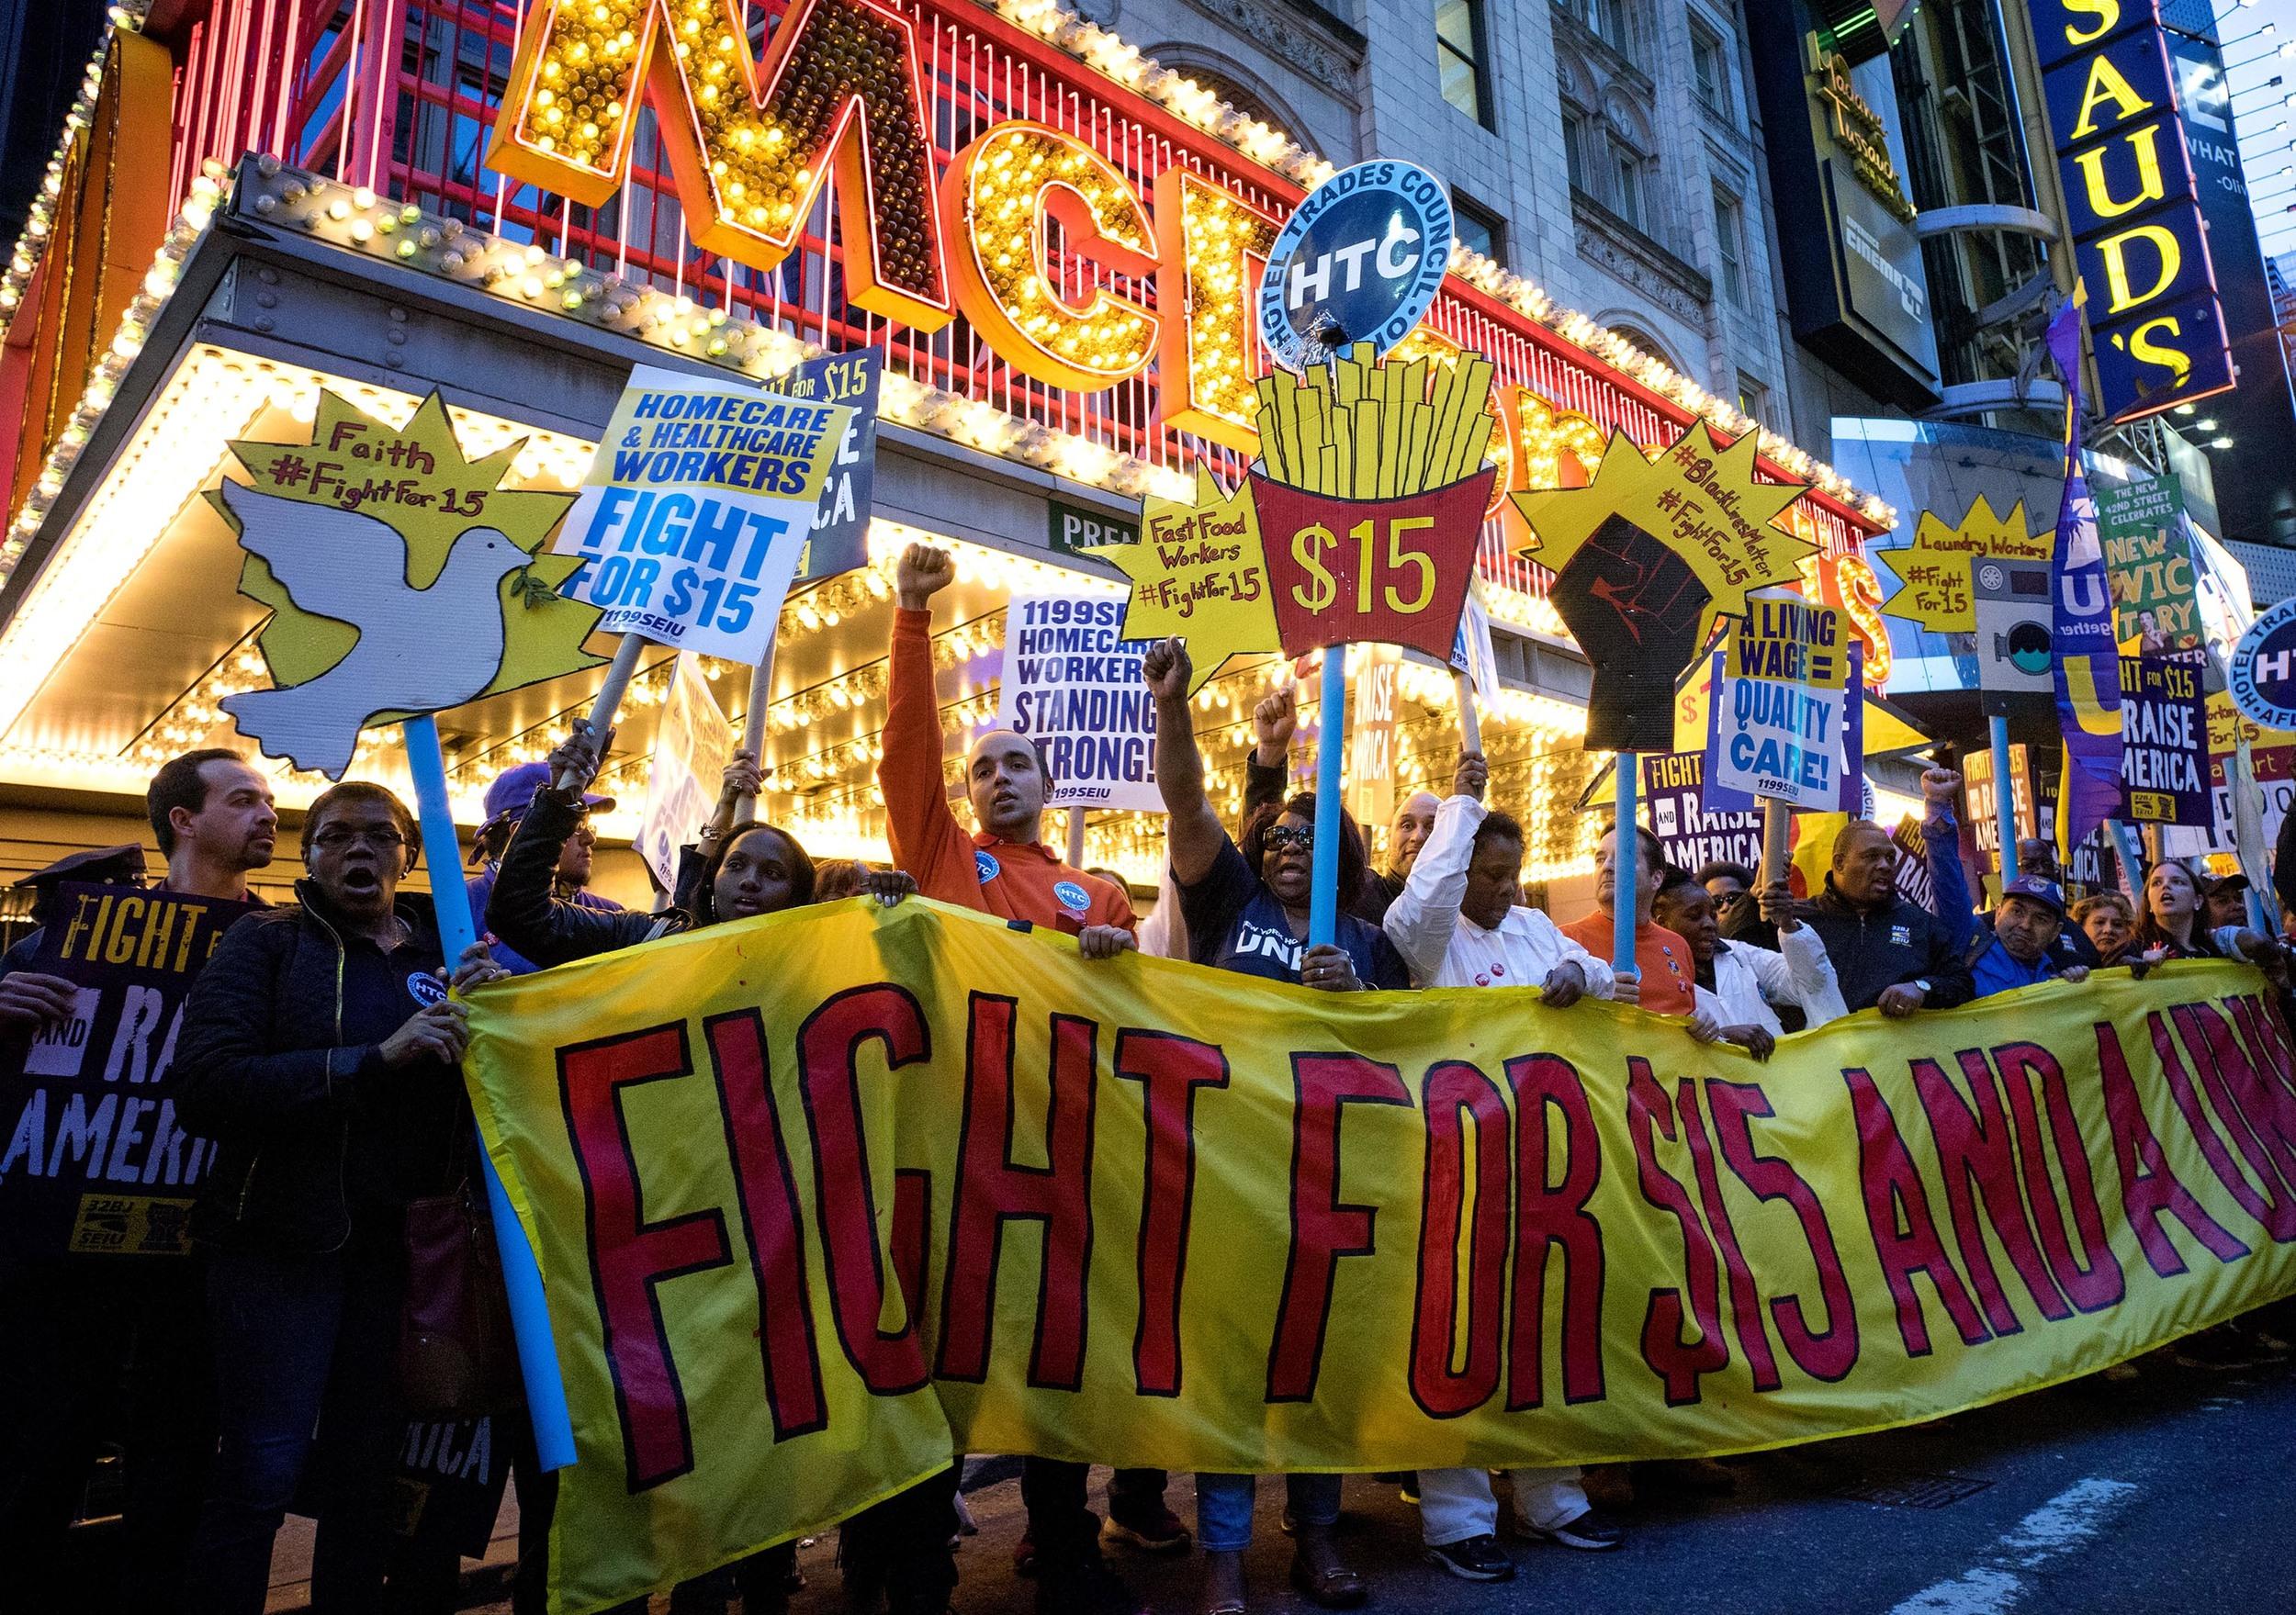 fast_food_protests-copy.jpg